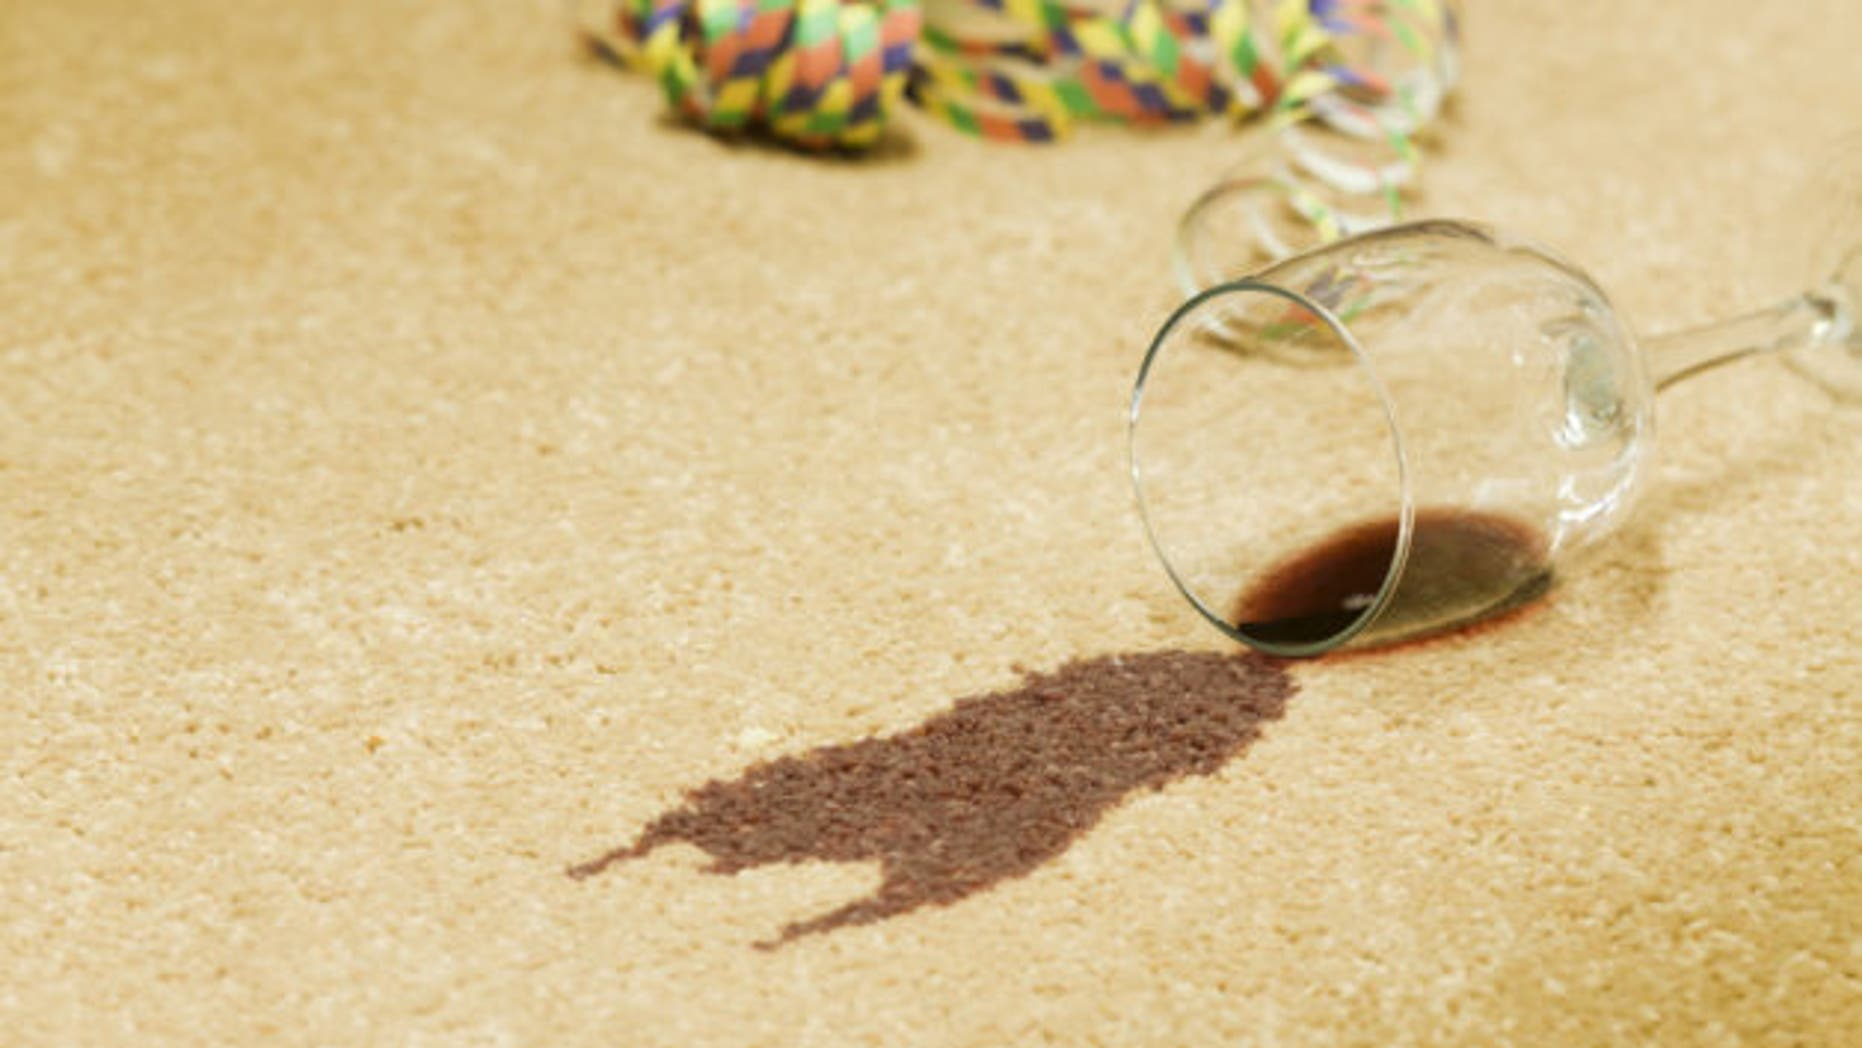 Red wine spilled on a beige carpet.